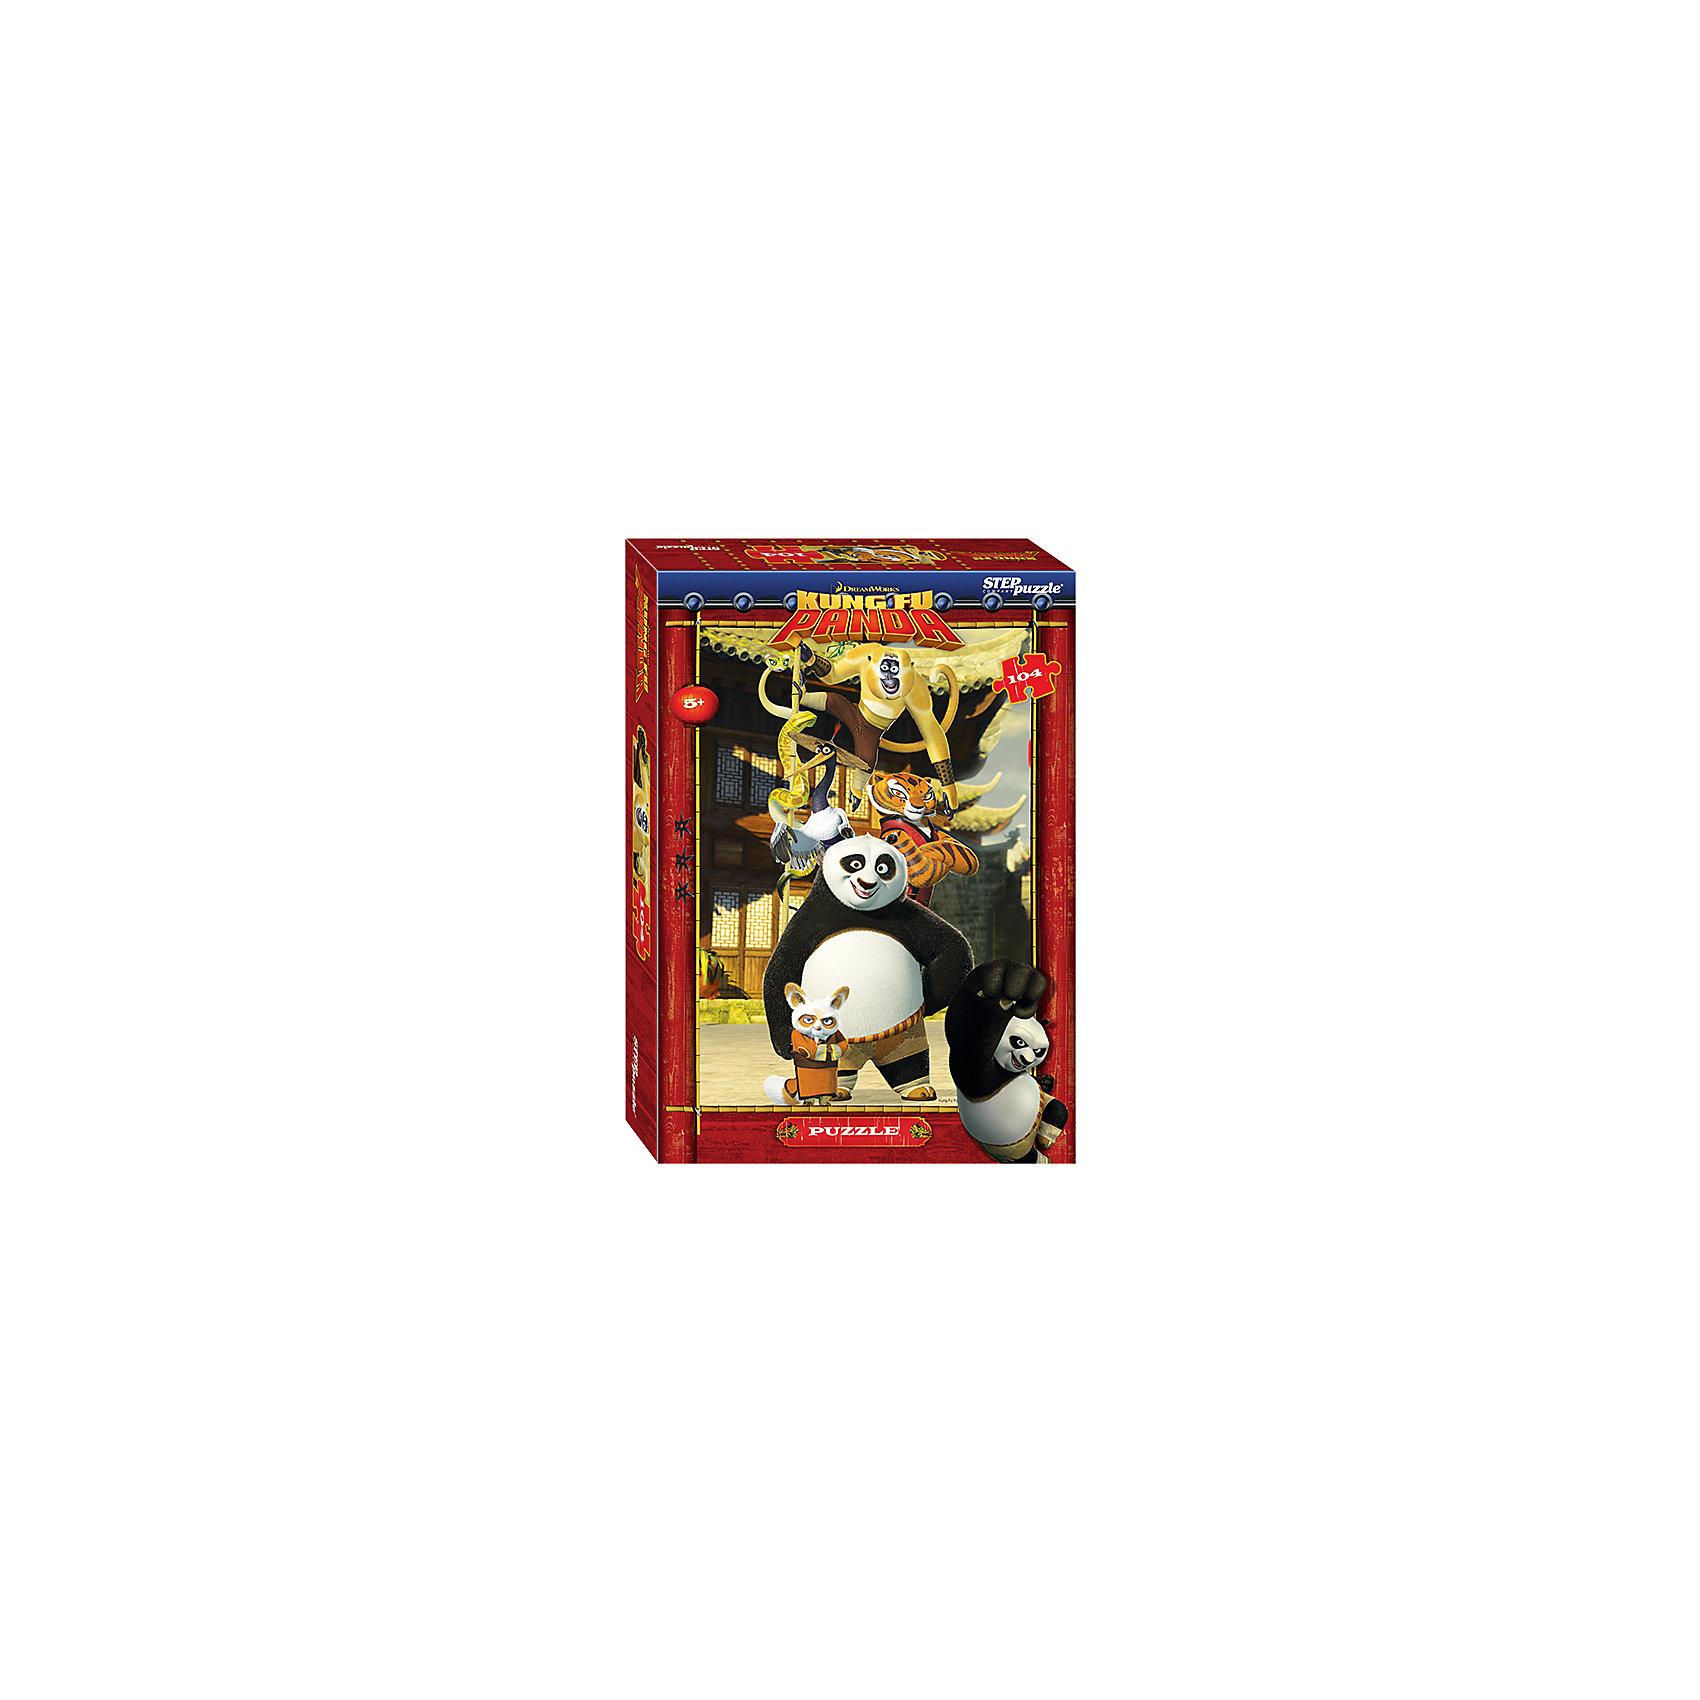 Степ Пазл Пазл Кунг-фу Панда, 104 детали, Step Puzzle купить газ 66 кунг в краснодарском крае